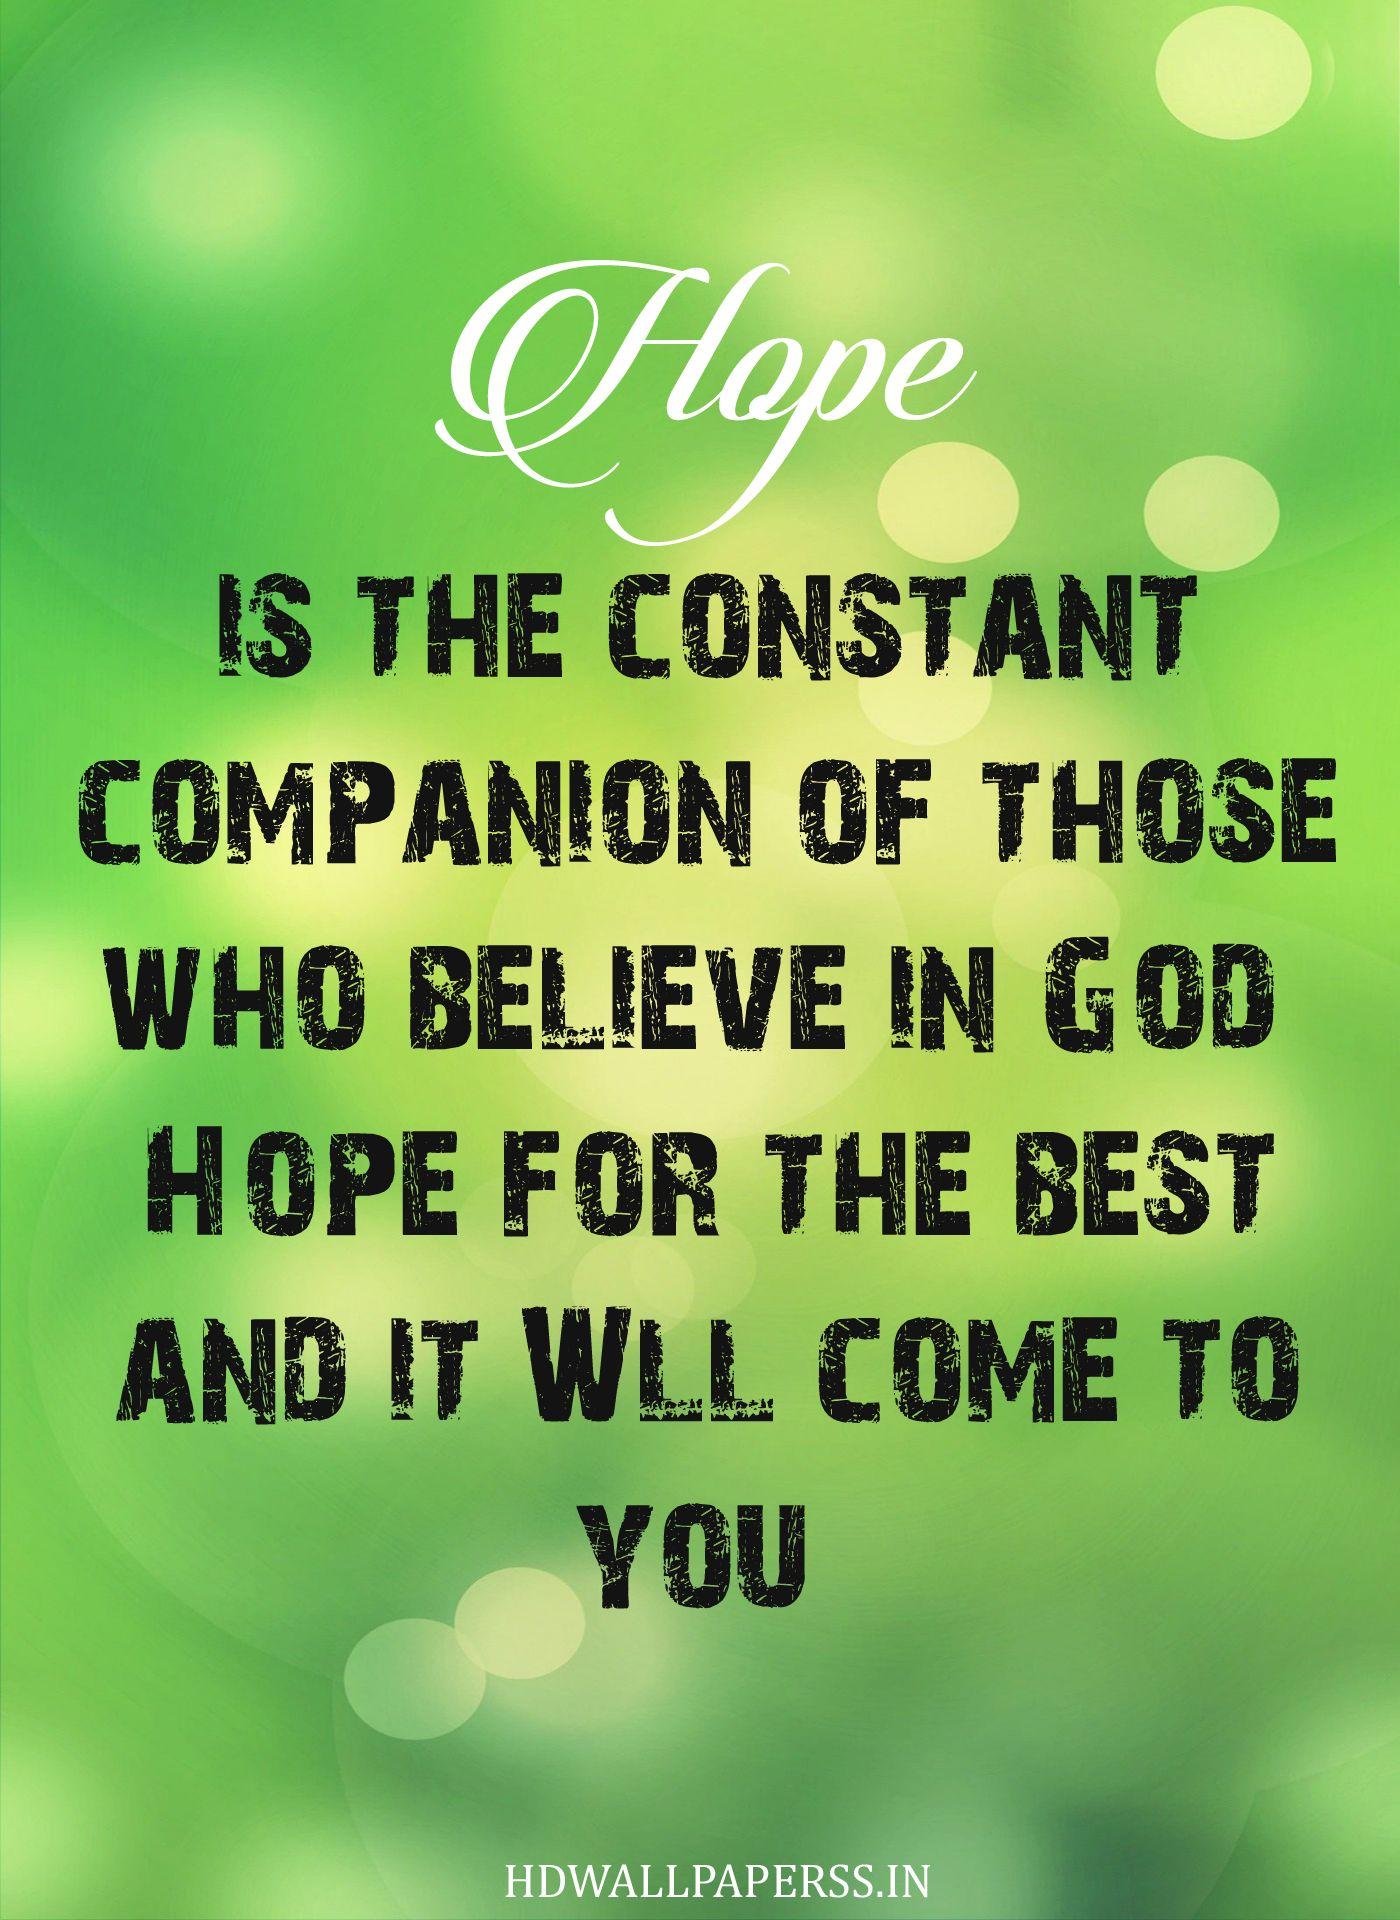 HopeMotivationalQuotesforwhatsappprofilepic.jpg